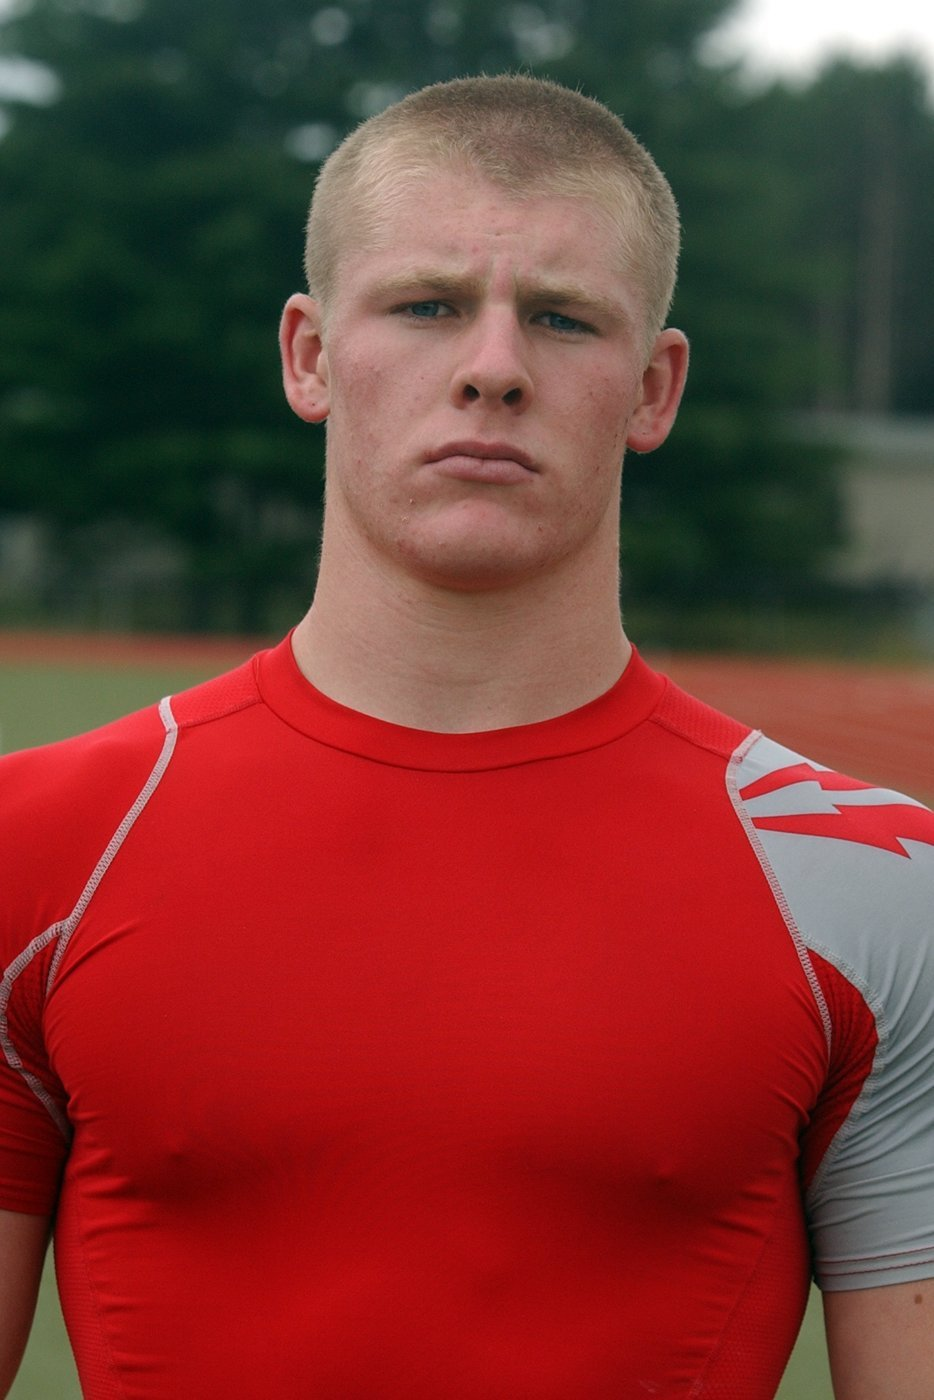 . Milford High School football player Kyle Podvin.